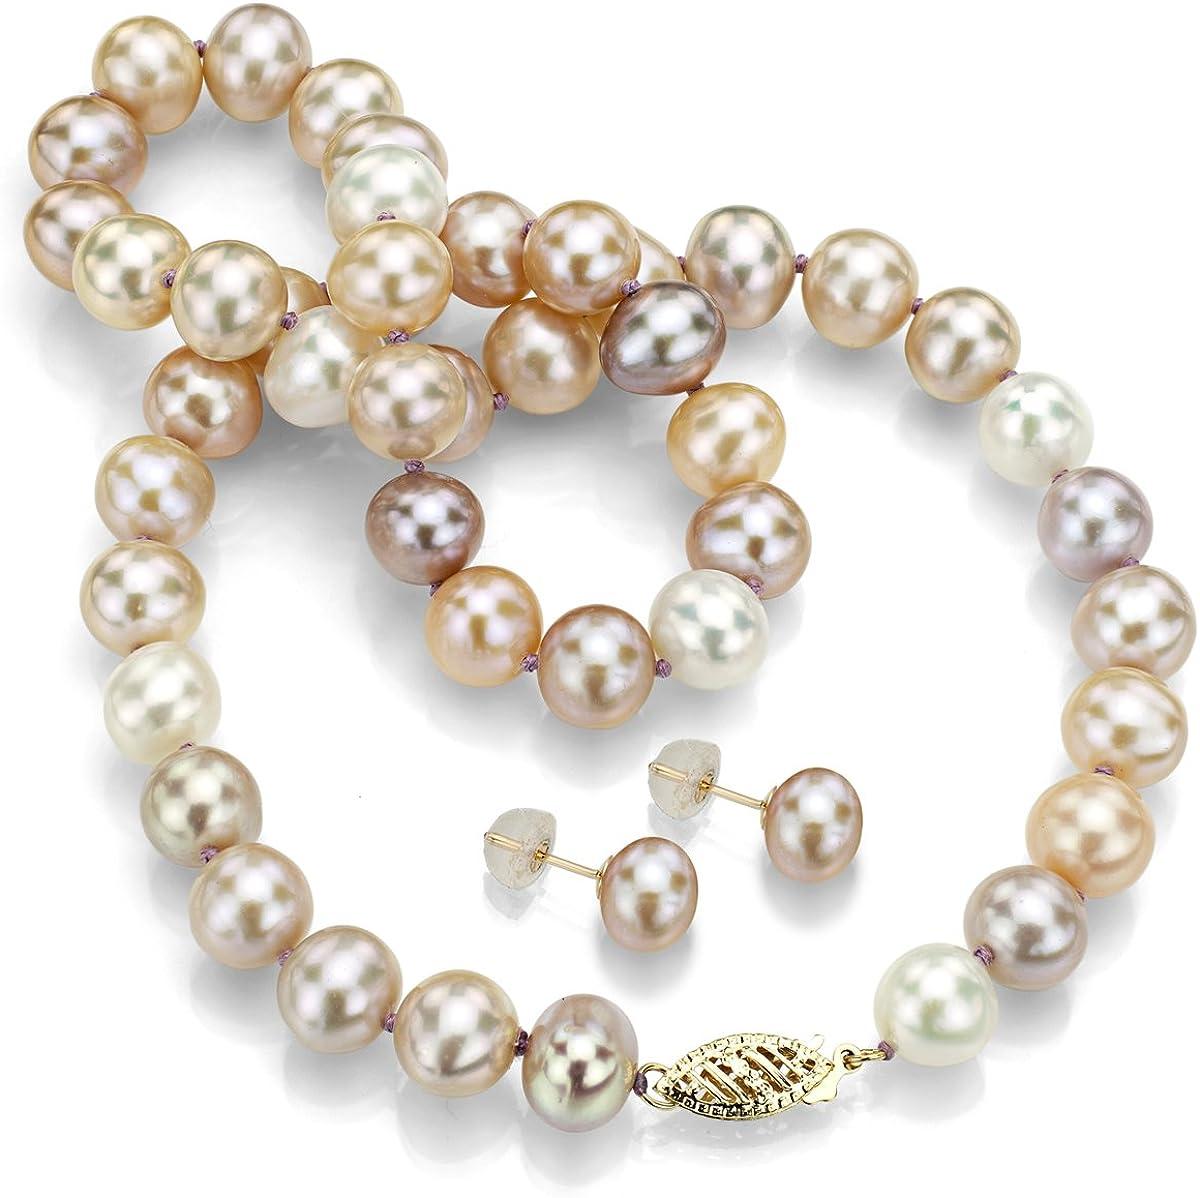 Nouveau Exquisite 14K OR MASSIF 4 mm /& 5 mm Naturel cultured pearl beaded Bracelet